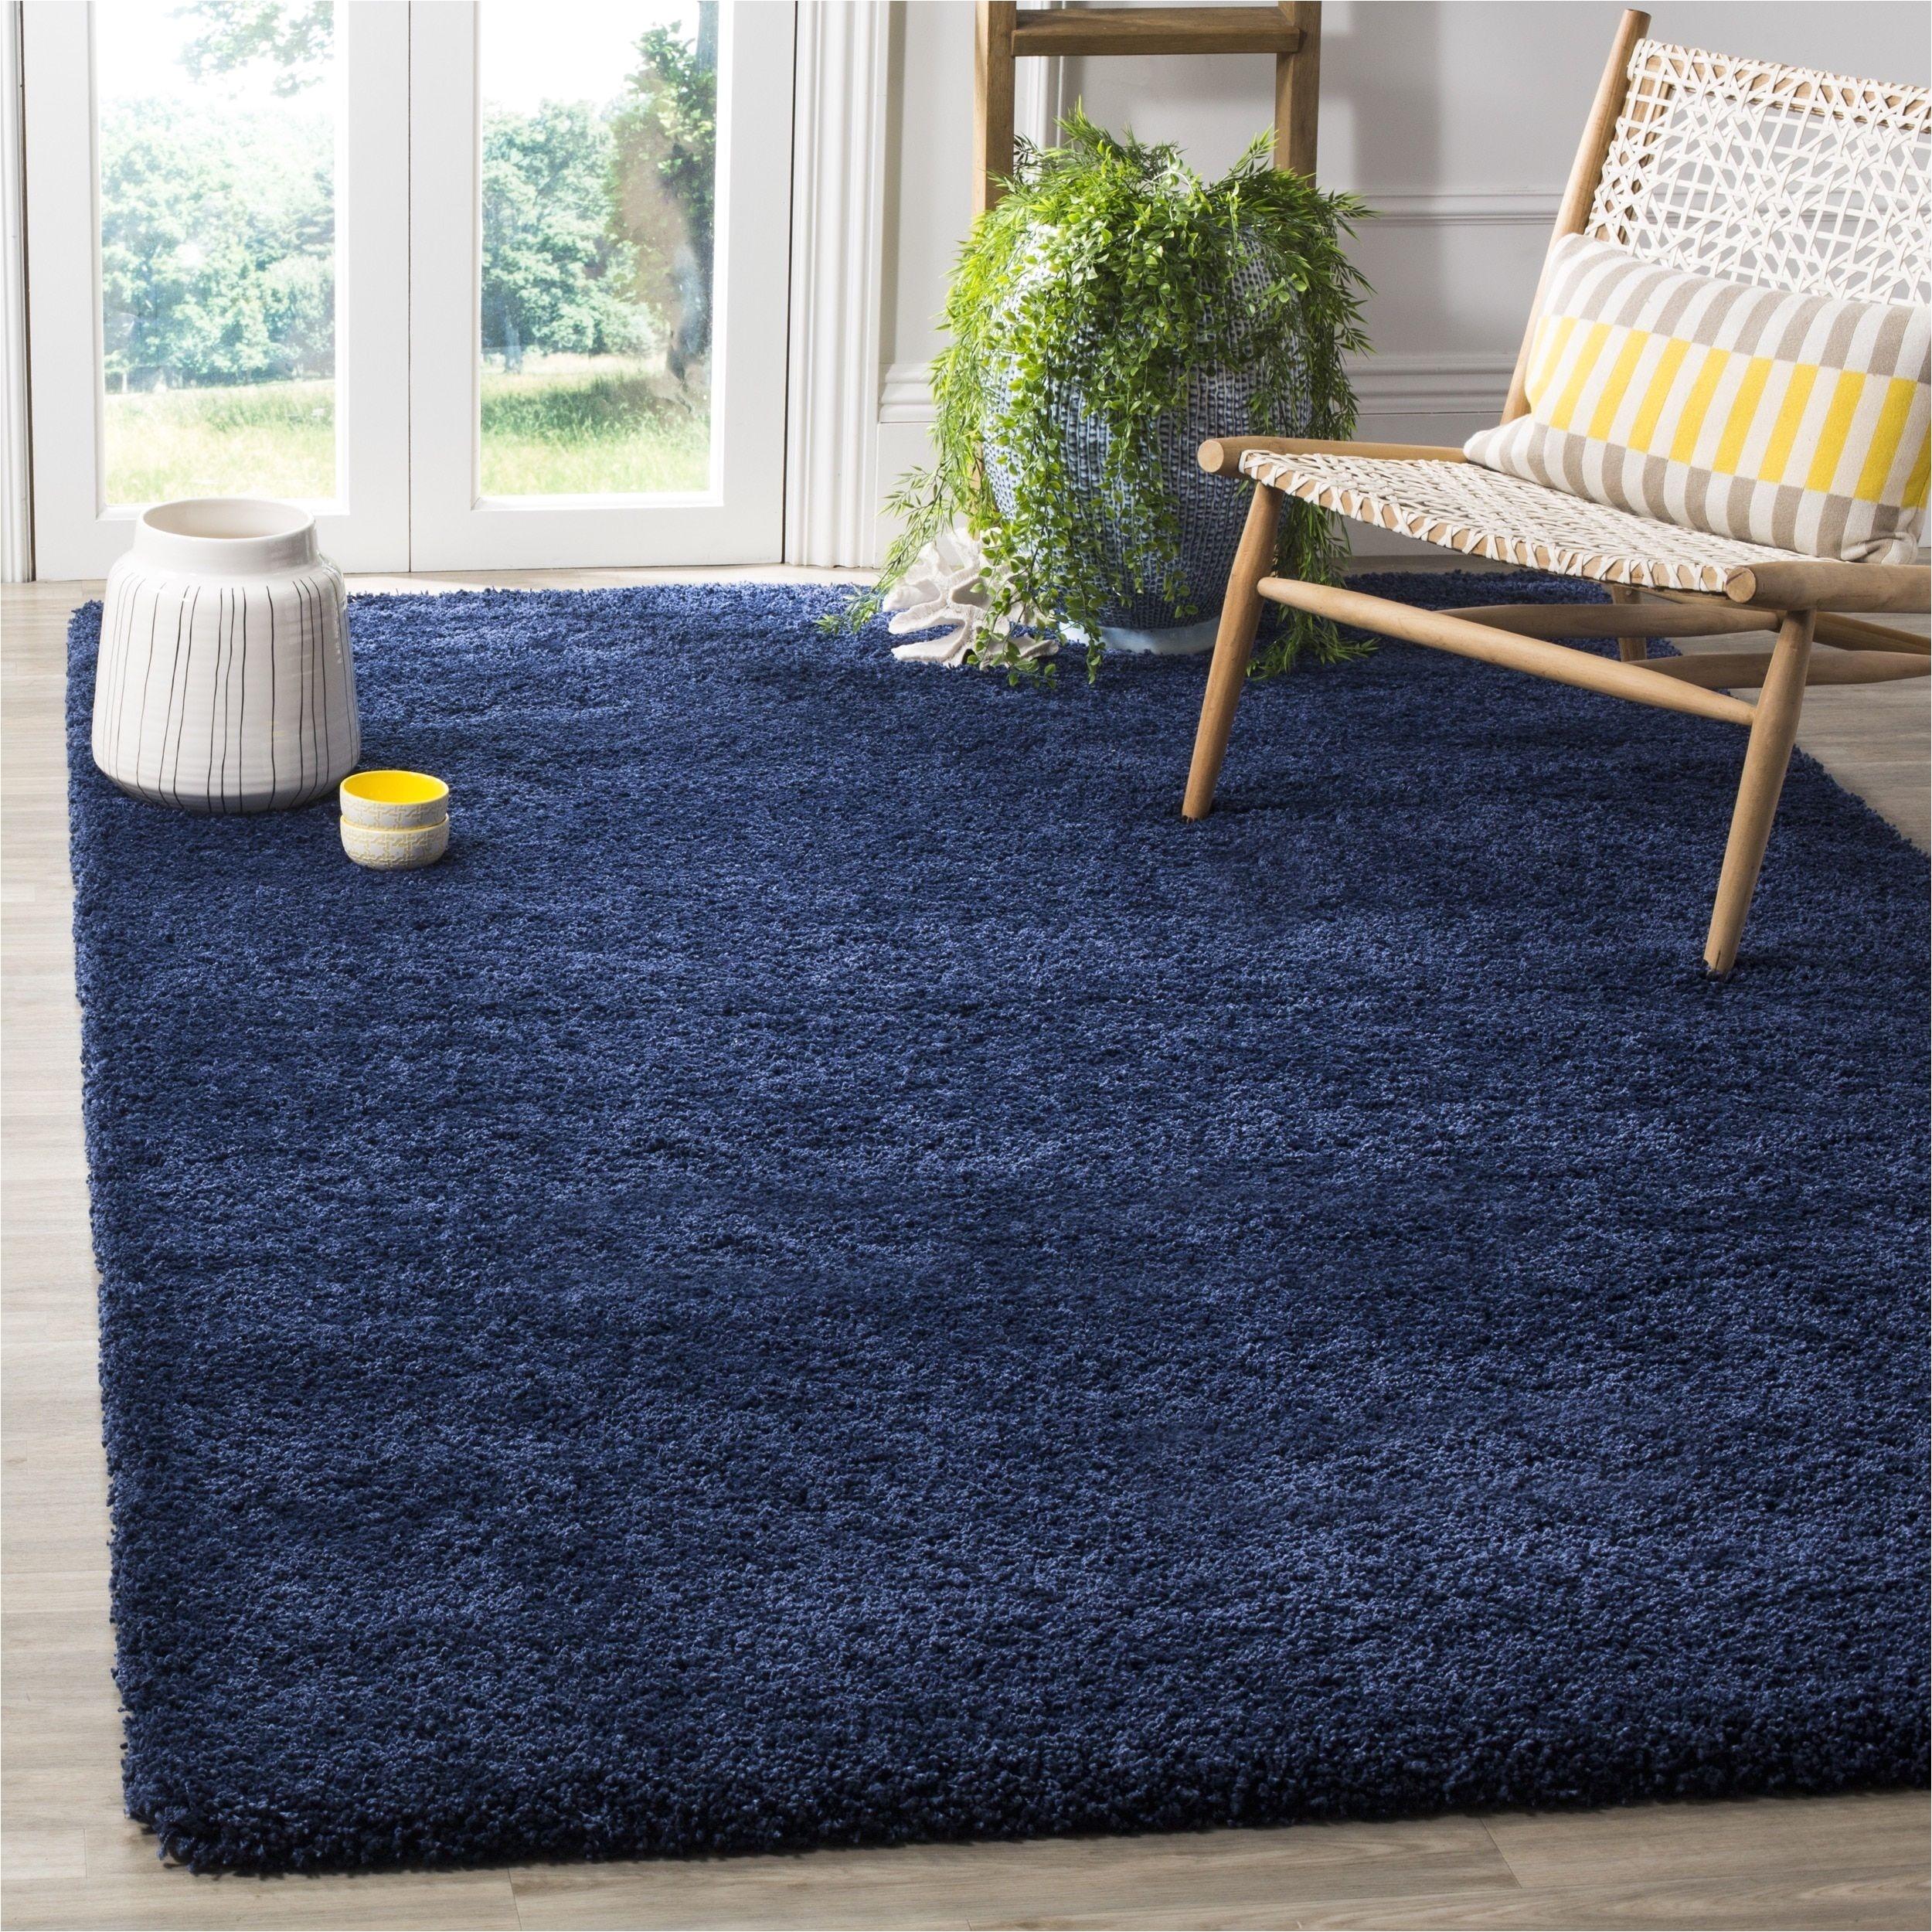 safavieh milan shag navy blue rug 5 1 square sg180 7070 5sq size 5 x 5 olefin solid